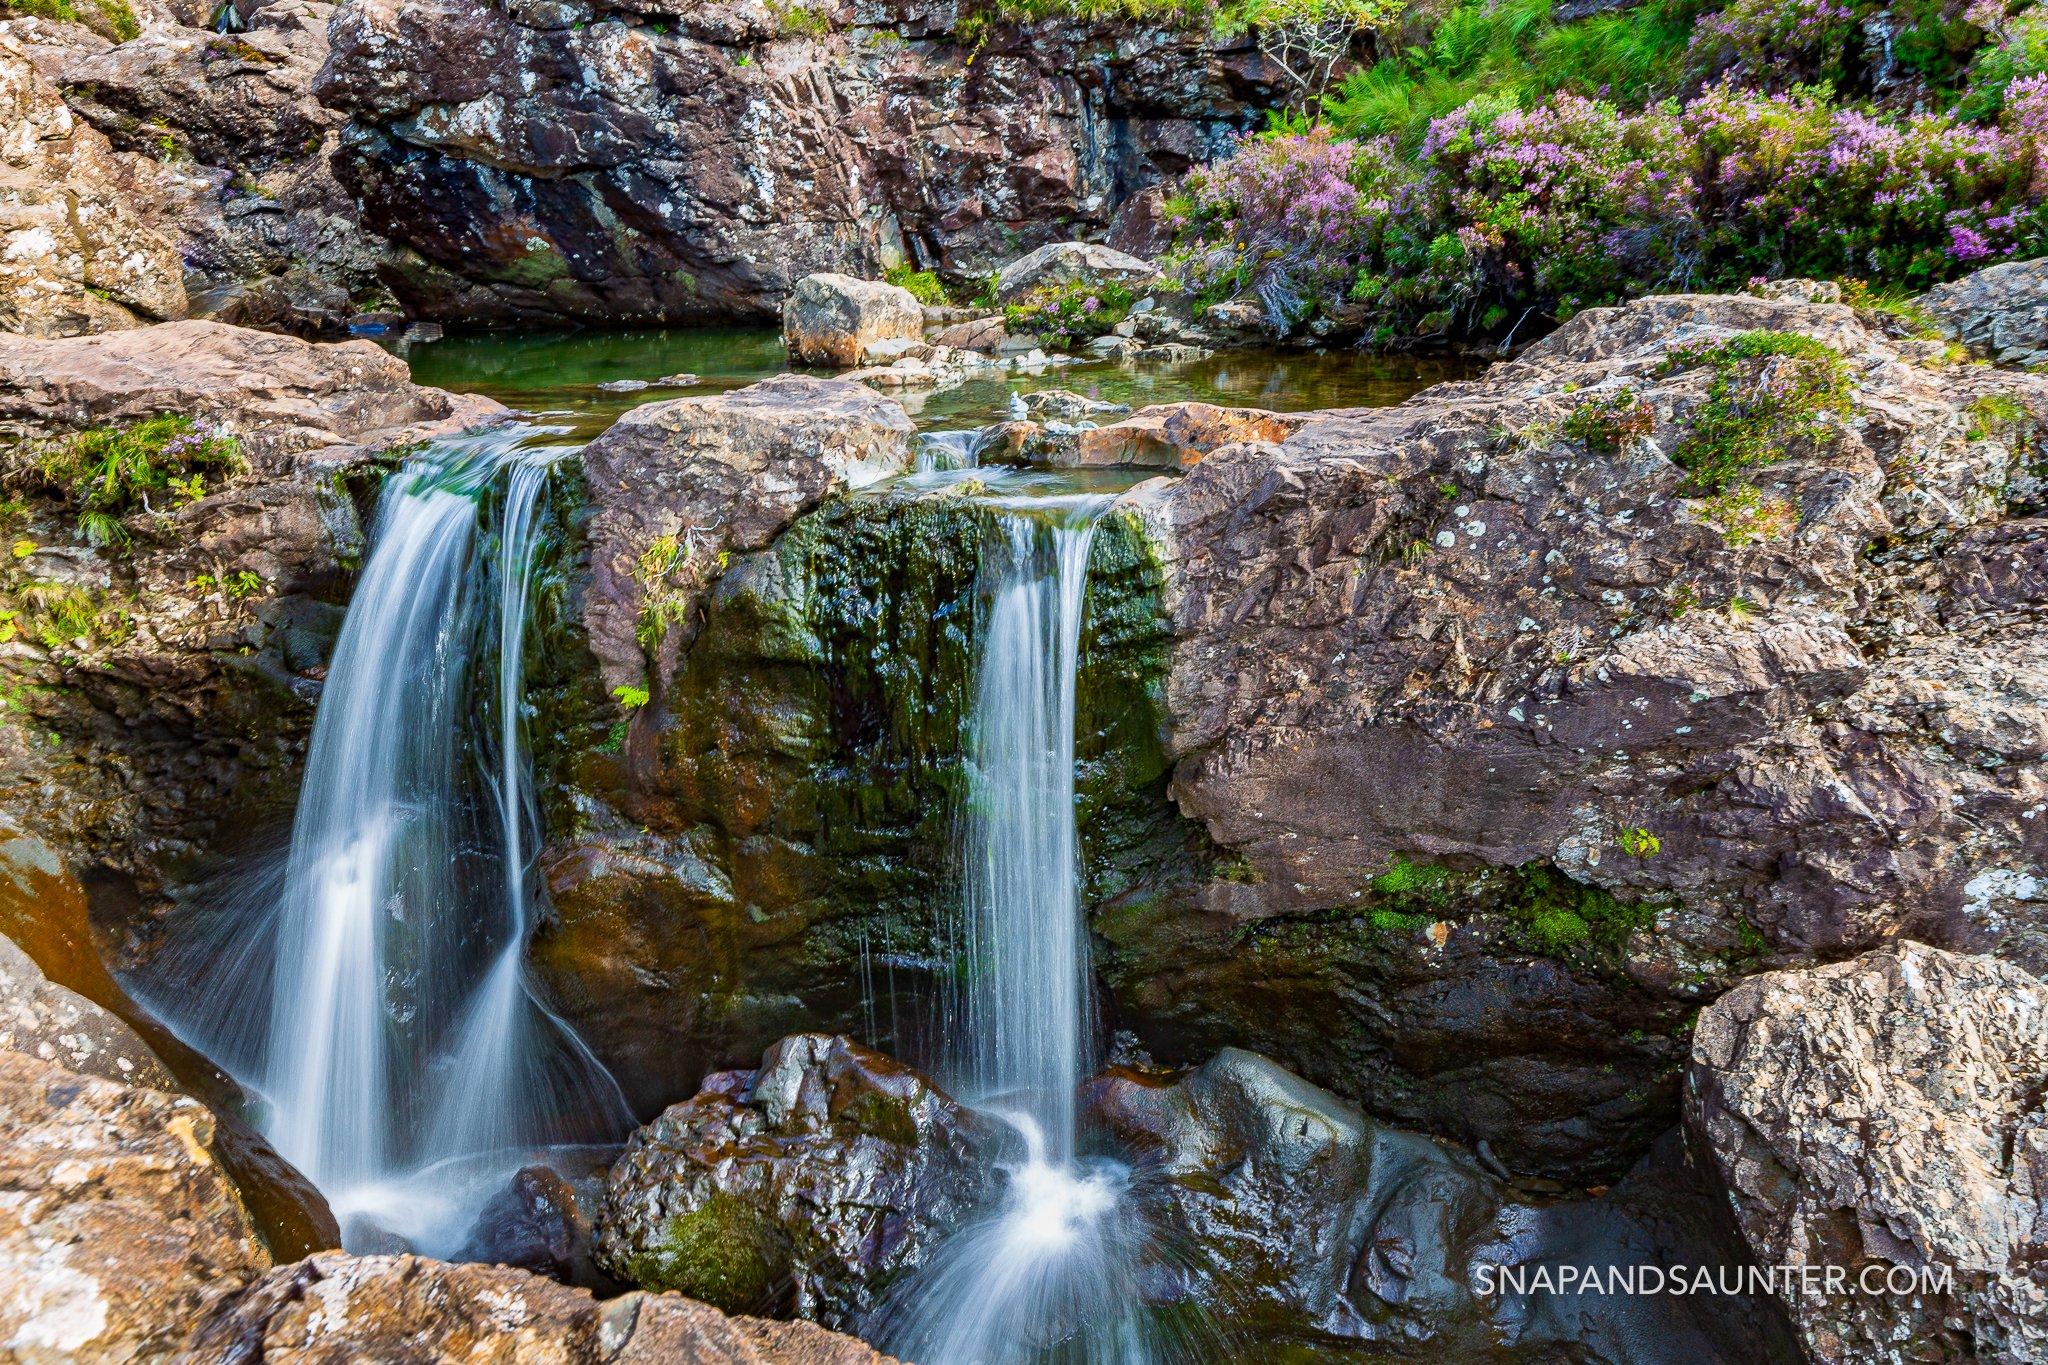 Fairy Pools waterfalls on the Isle of Skye in Scotland